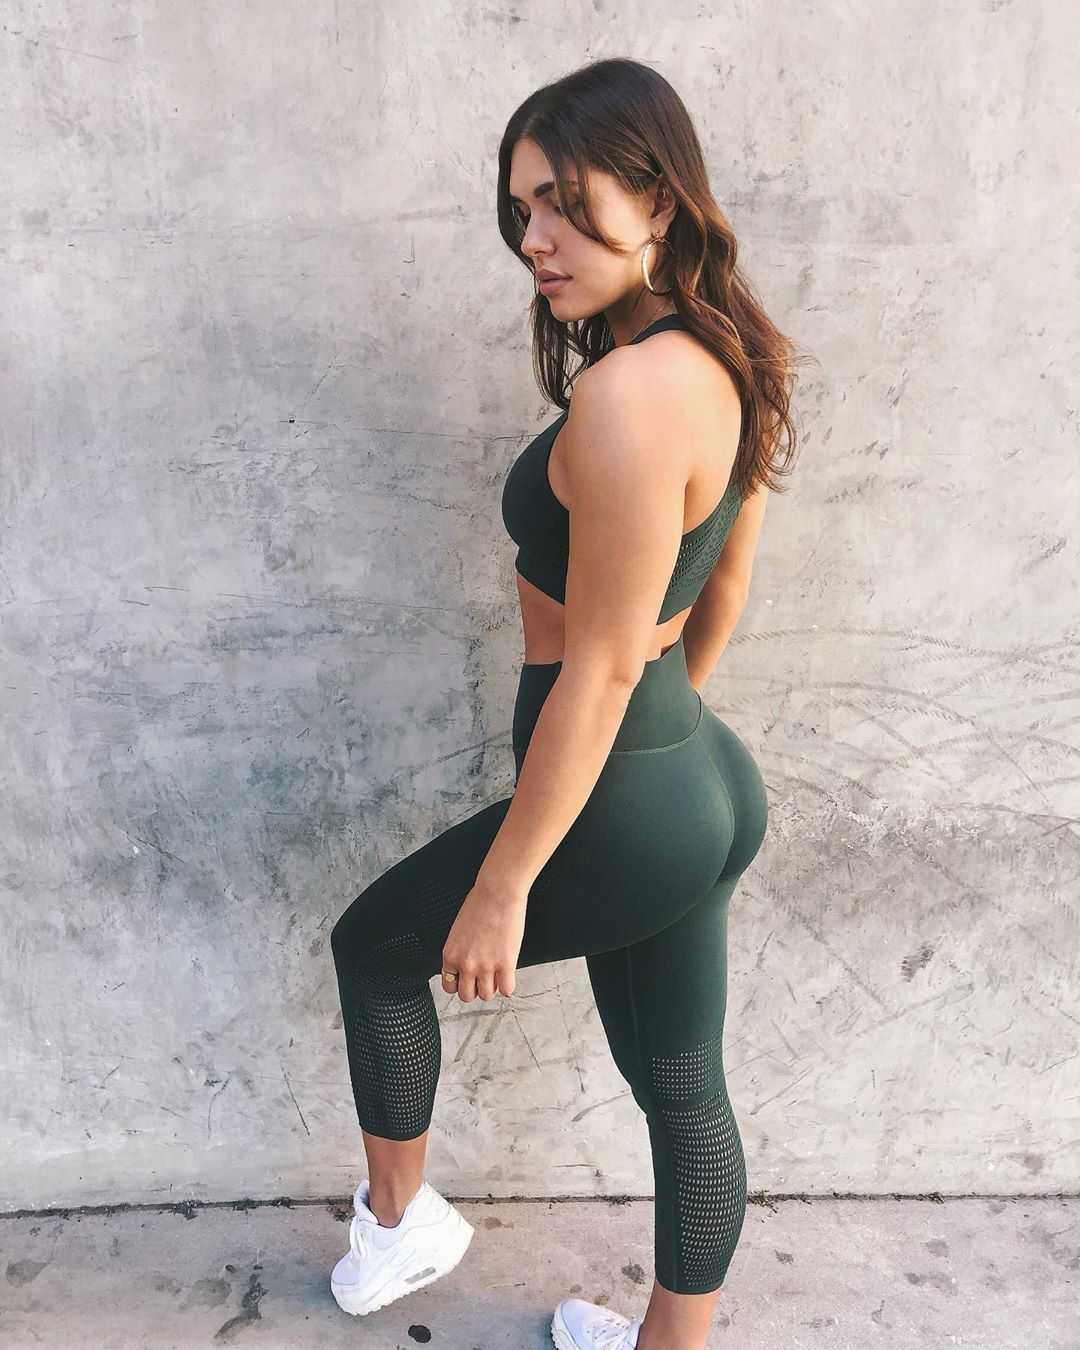 dana caprio big booty